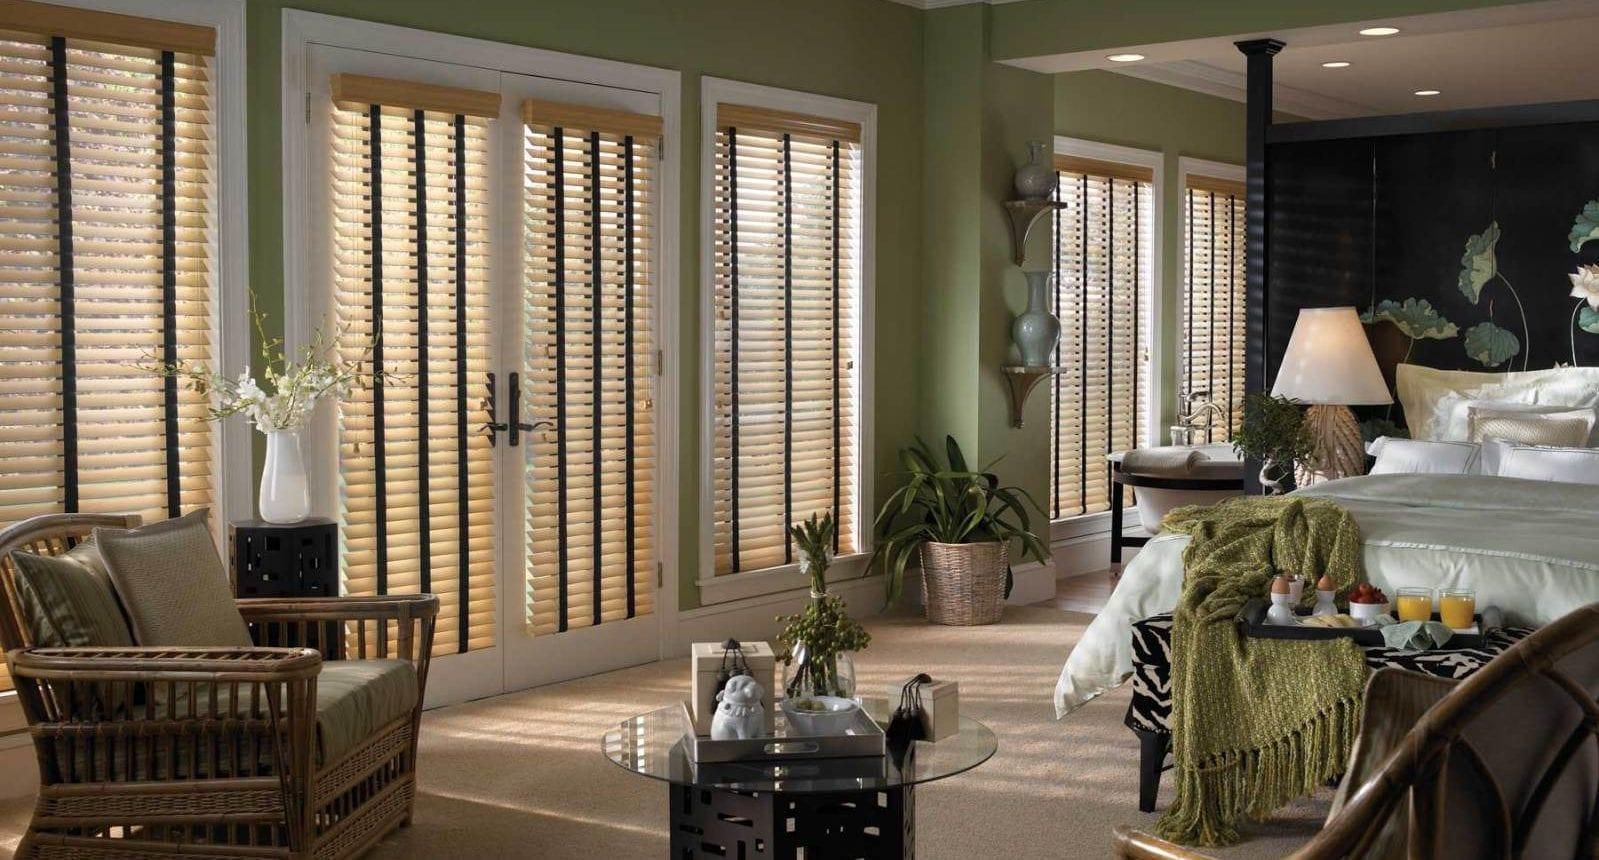 Timberblind Hillsborough NC Window Blinds